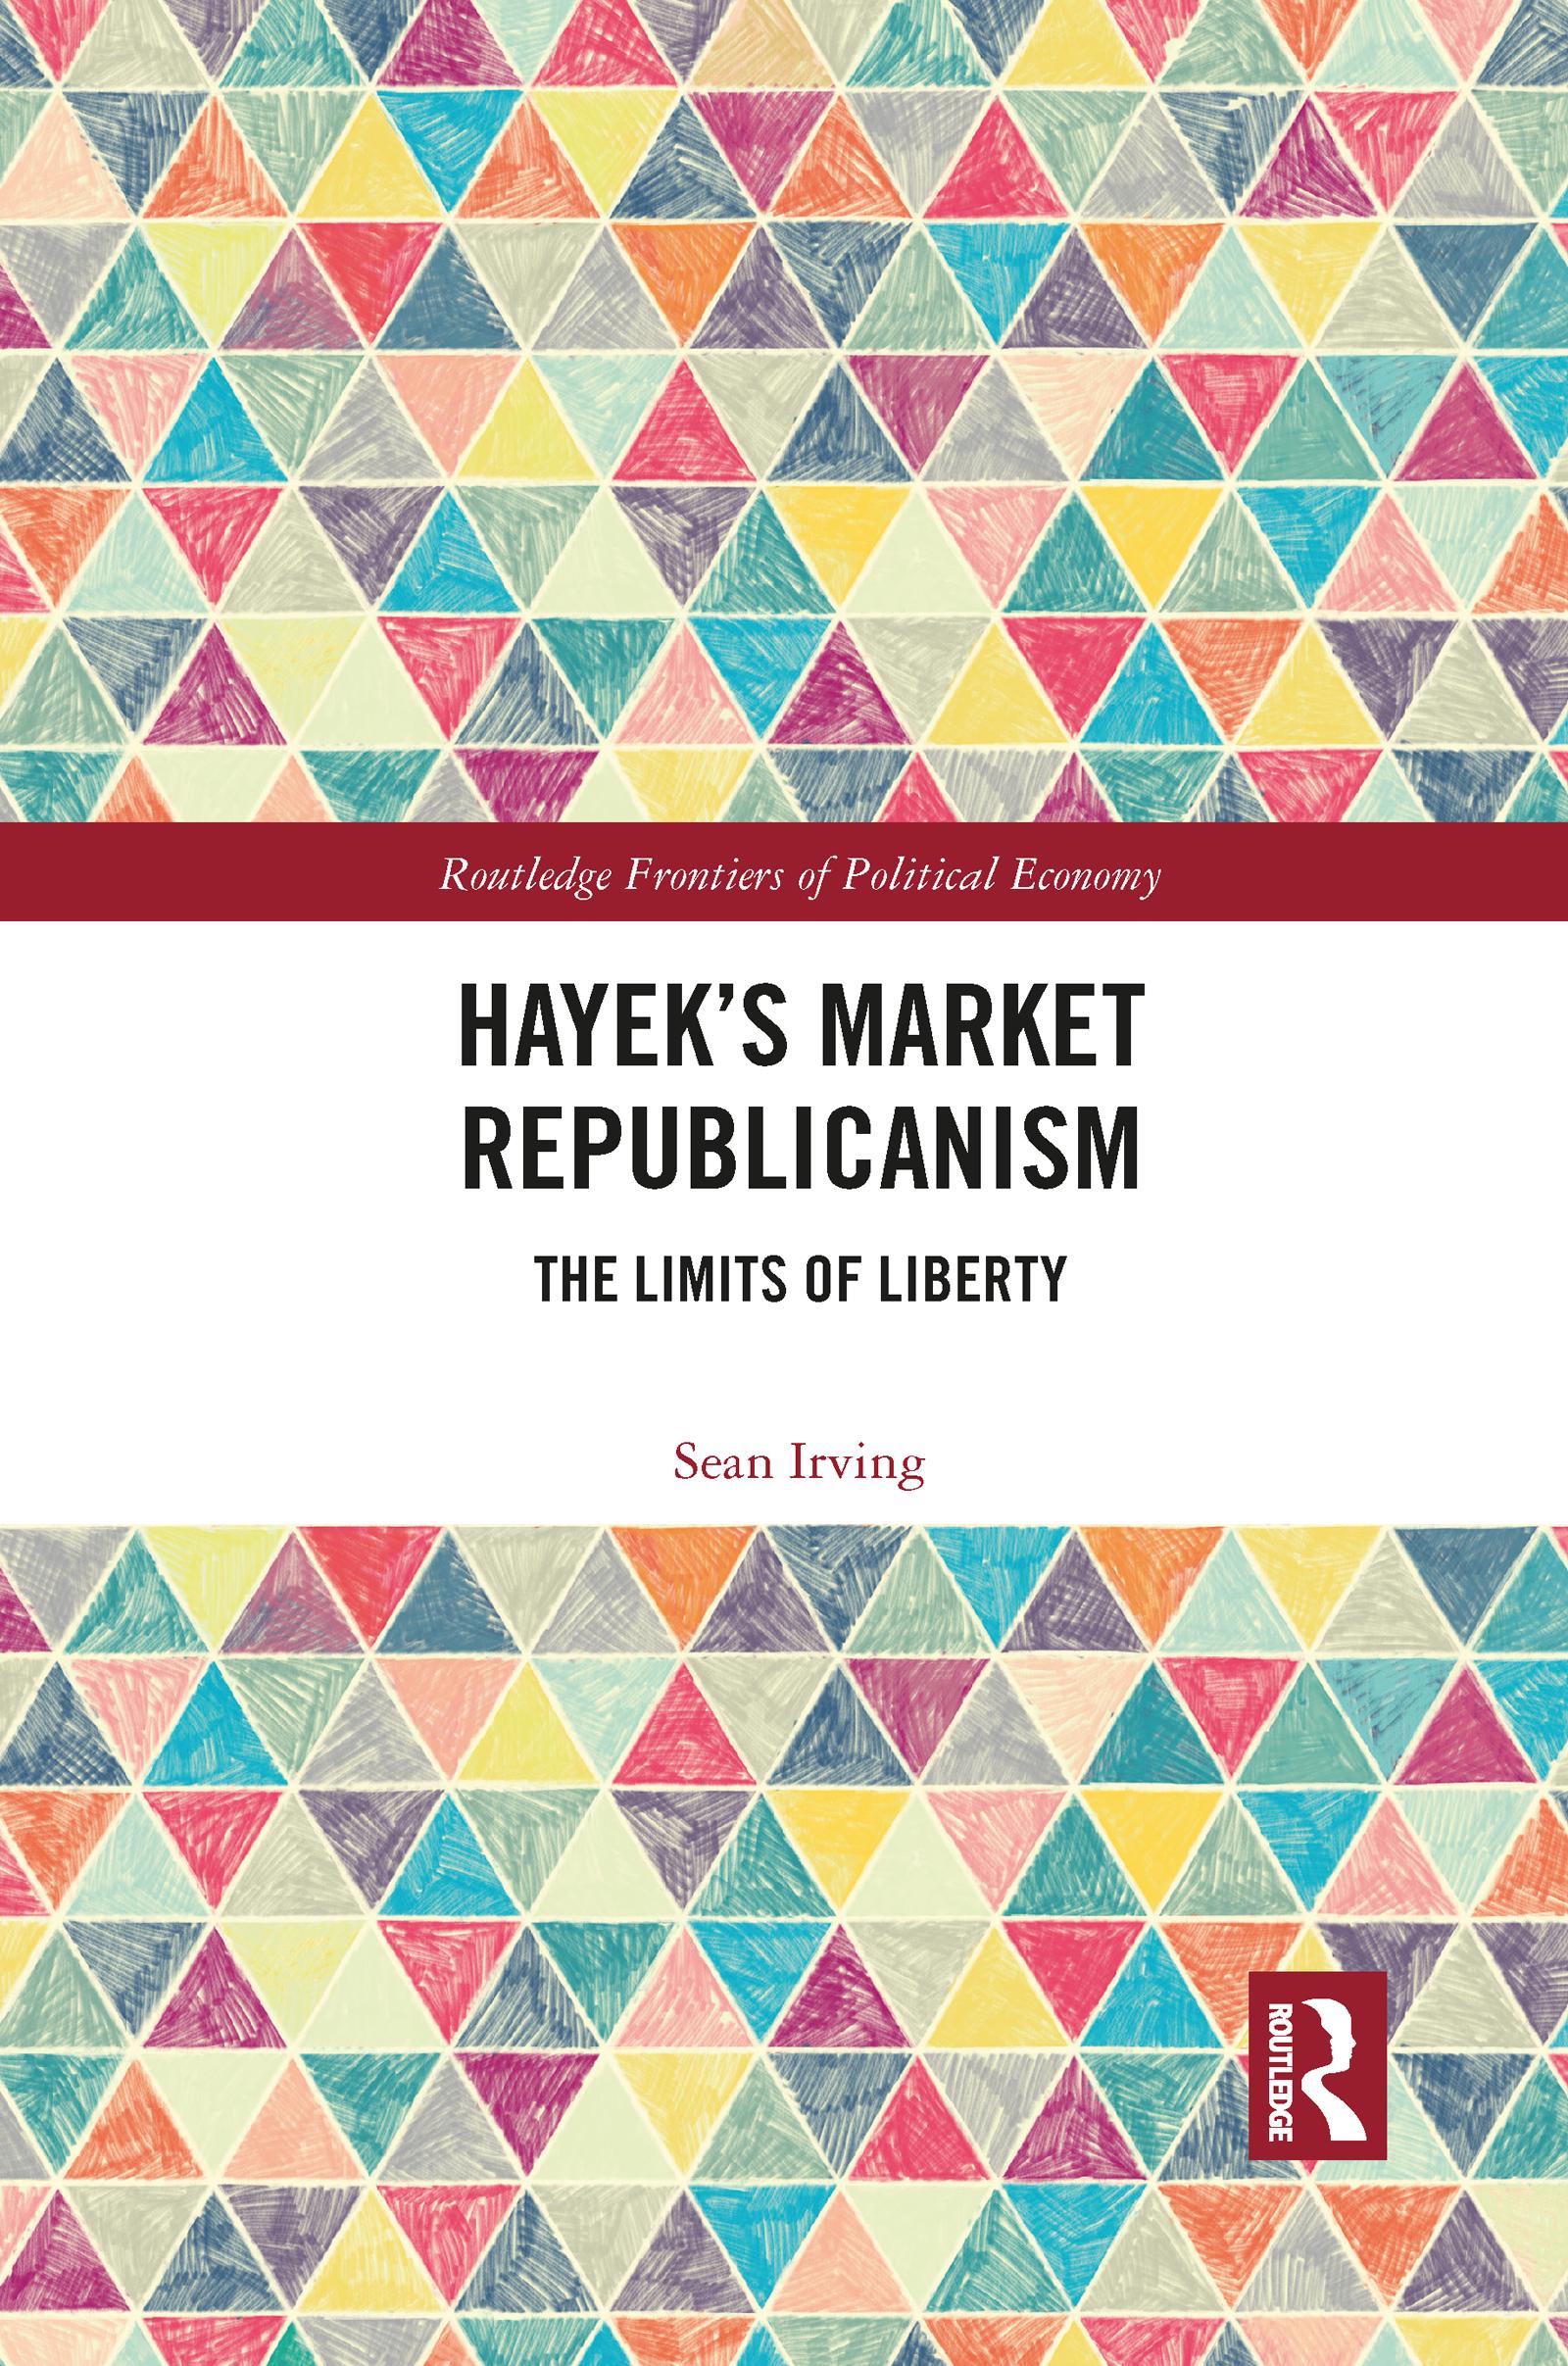 Hayek's Market Republicanism